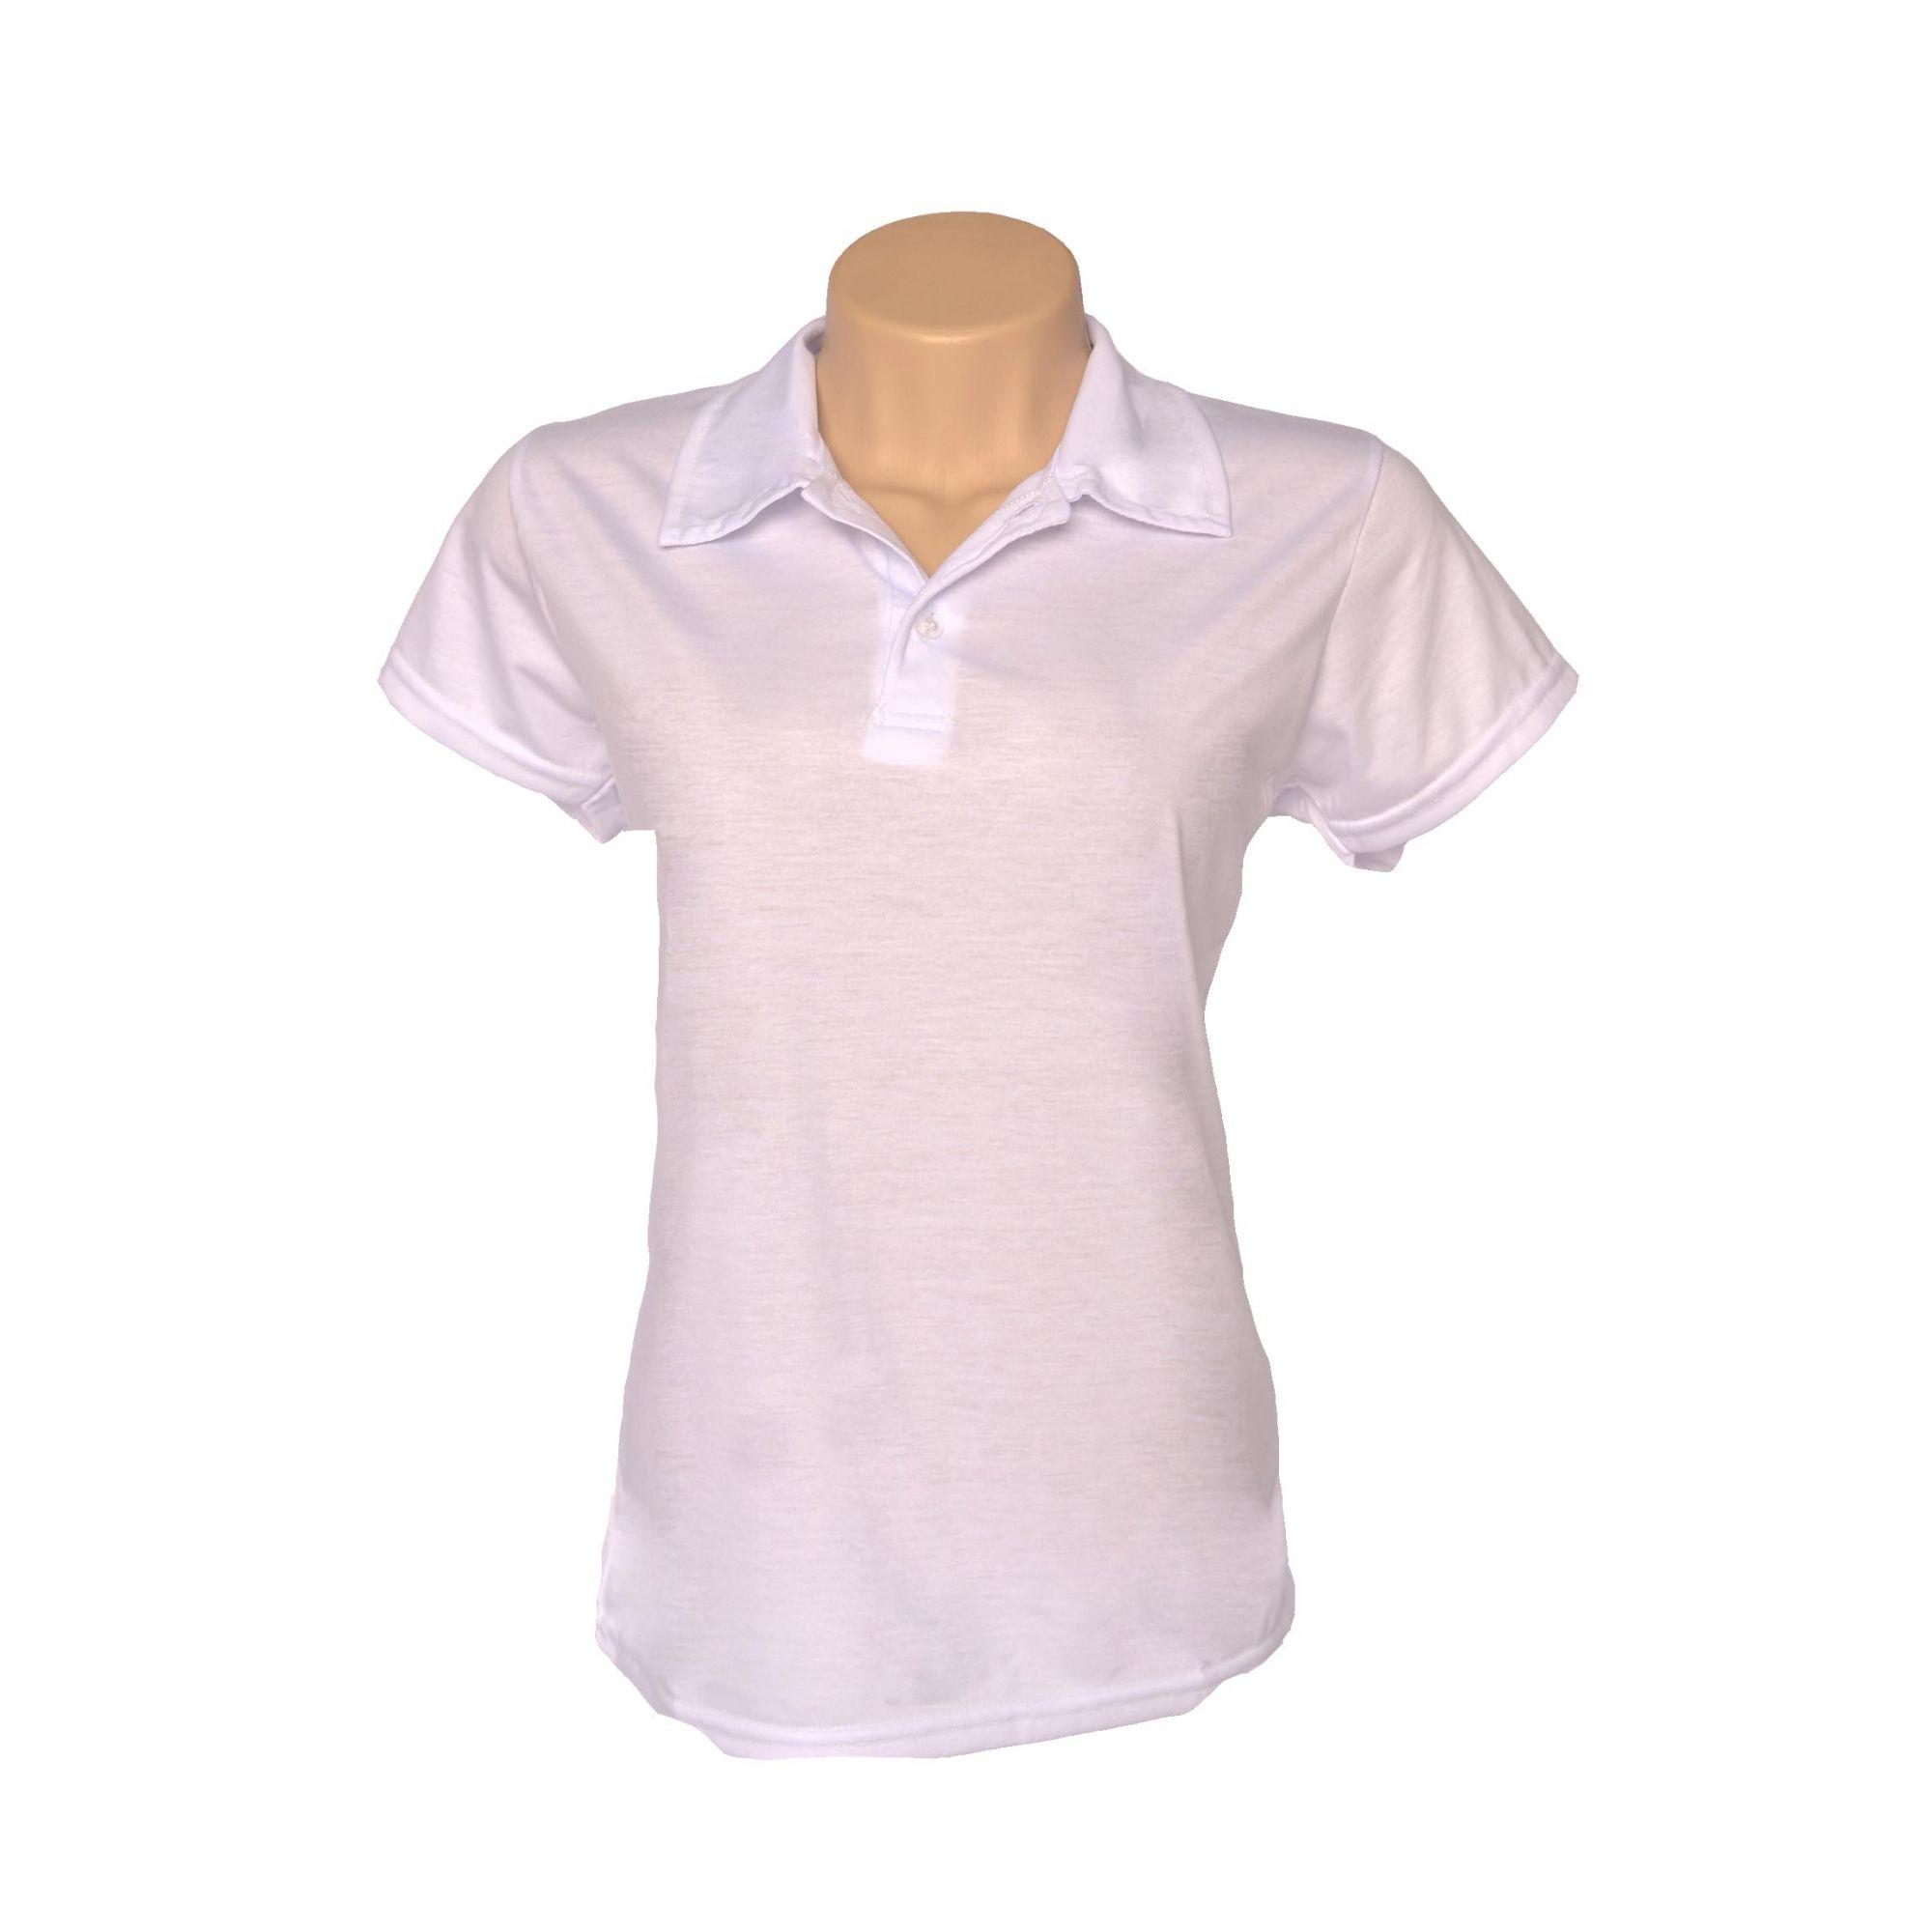 Camisa polo feminina - Pra Sublimar b0c13a3bdb9e4